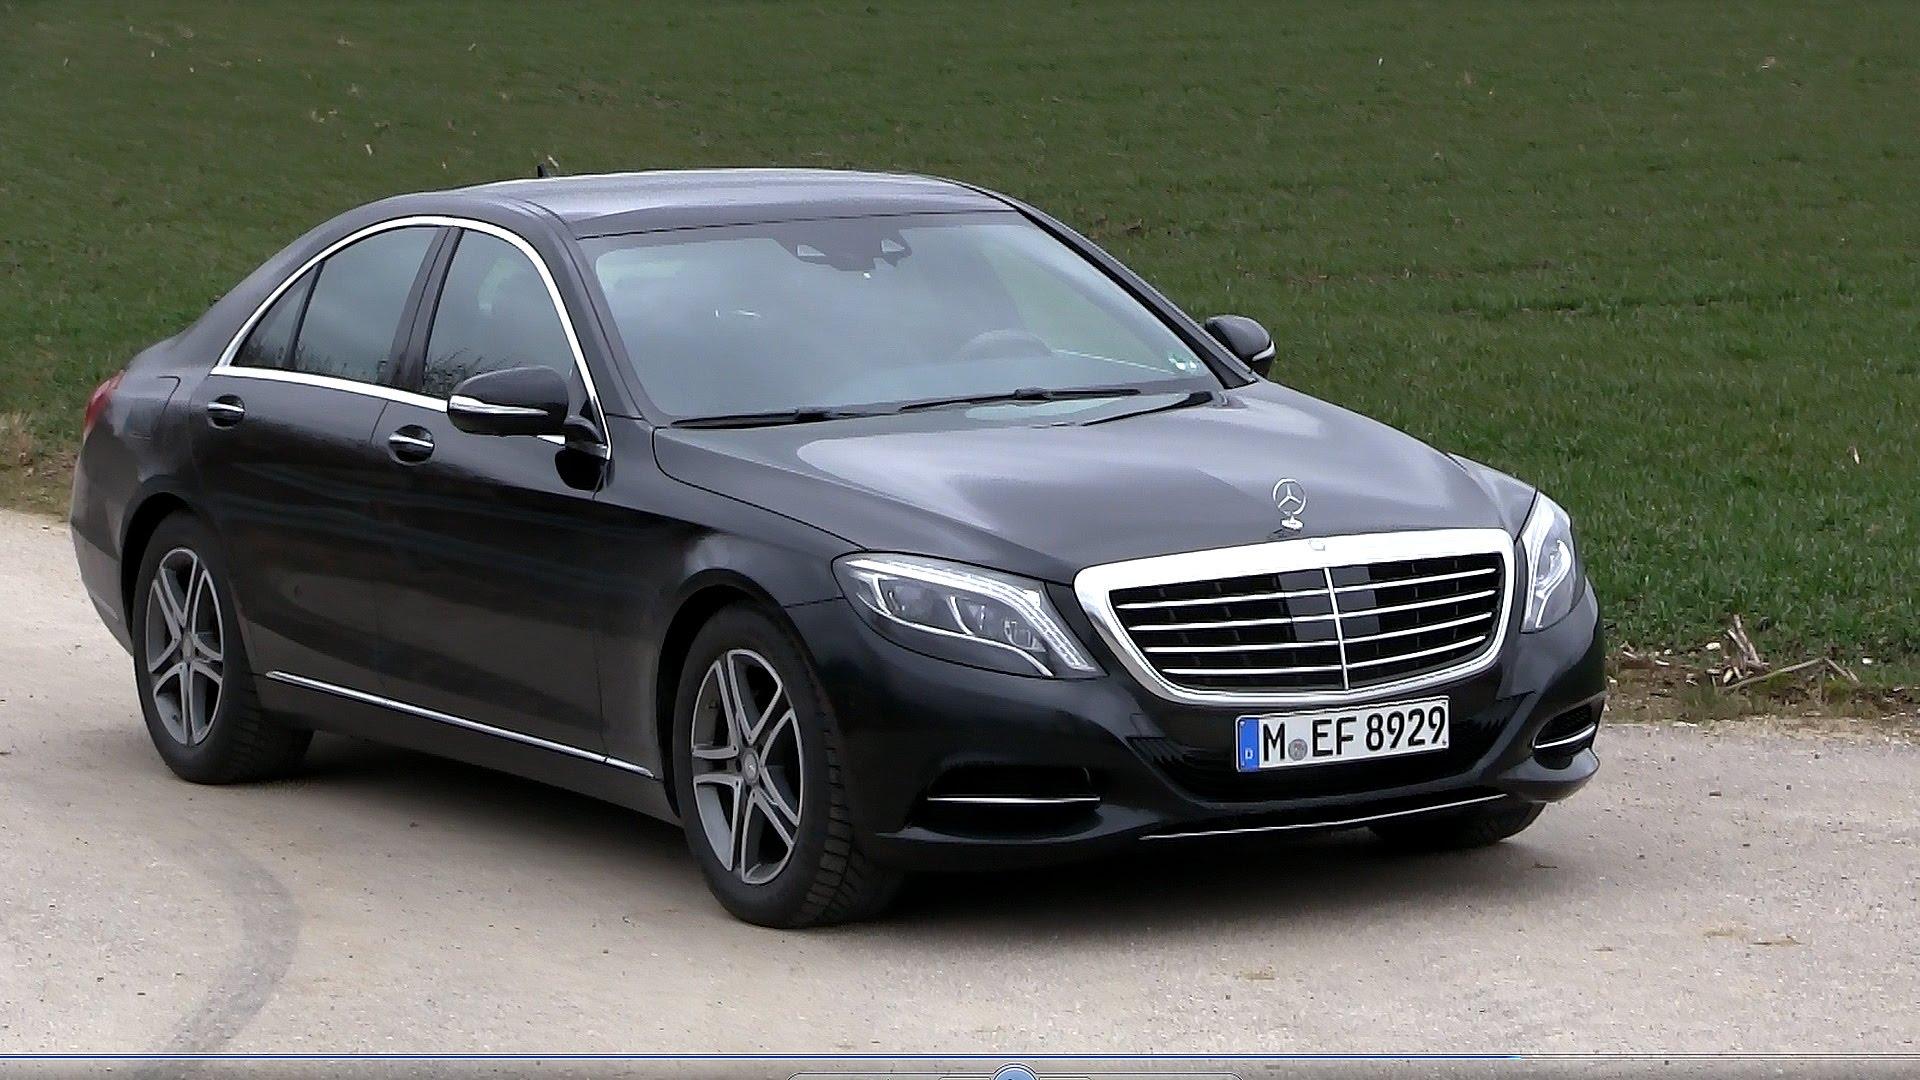 Mercedes-Benz S-klasse VI (W222, C217) 2013 - now Sedan #1